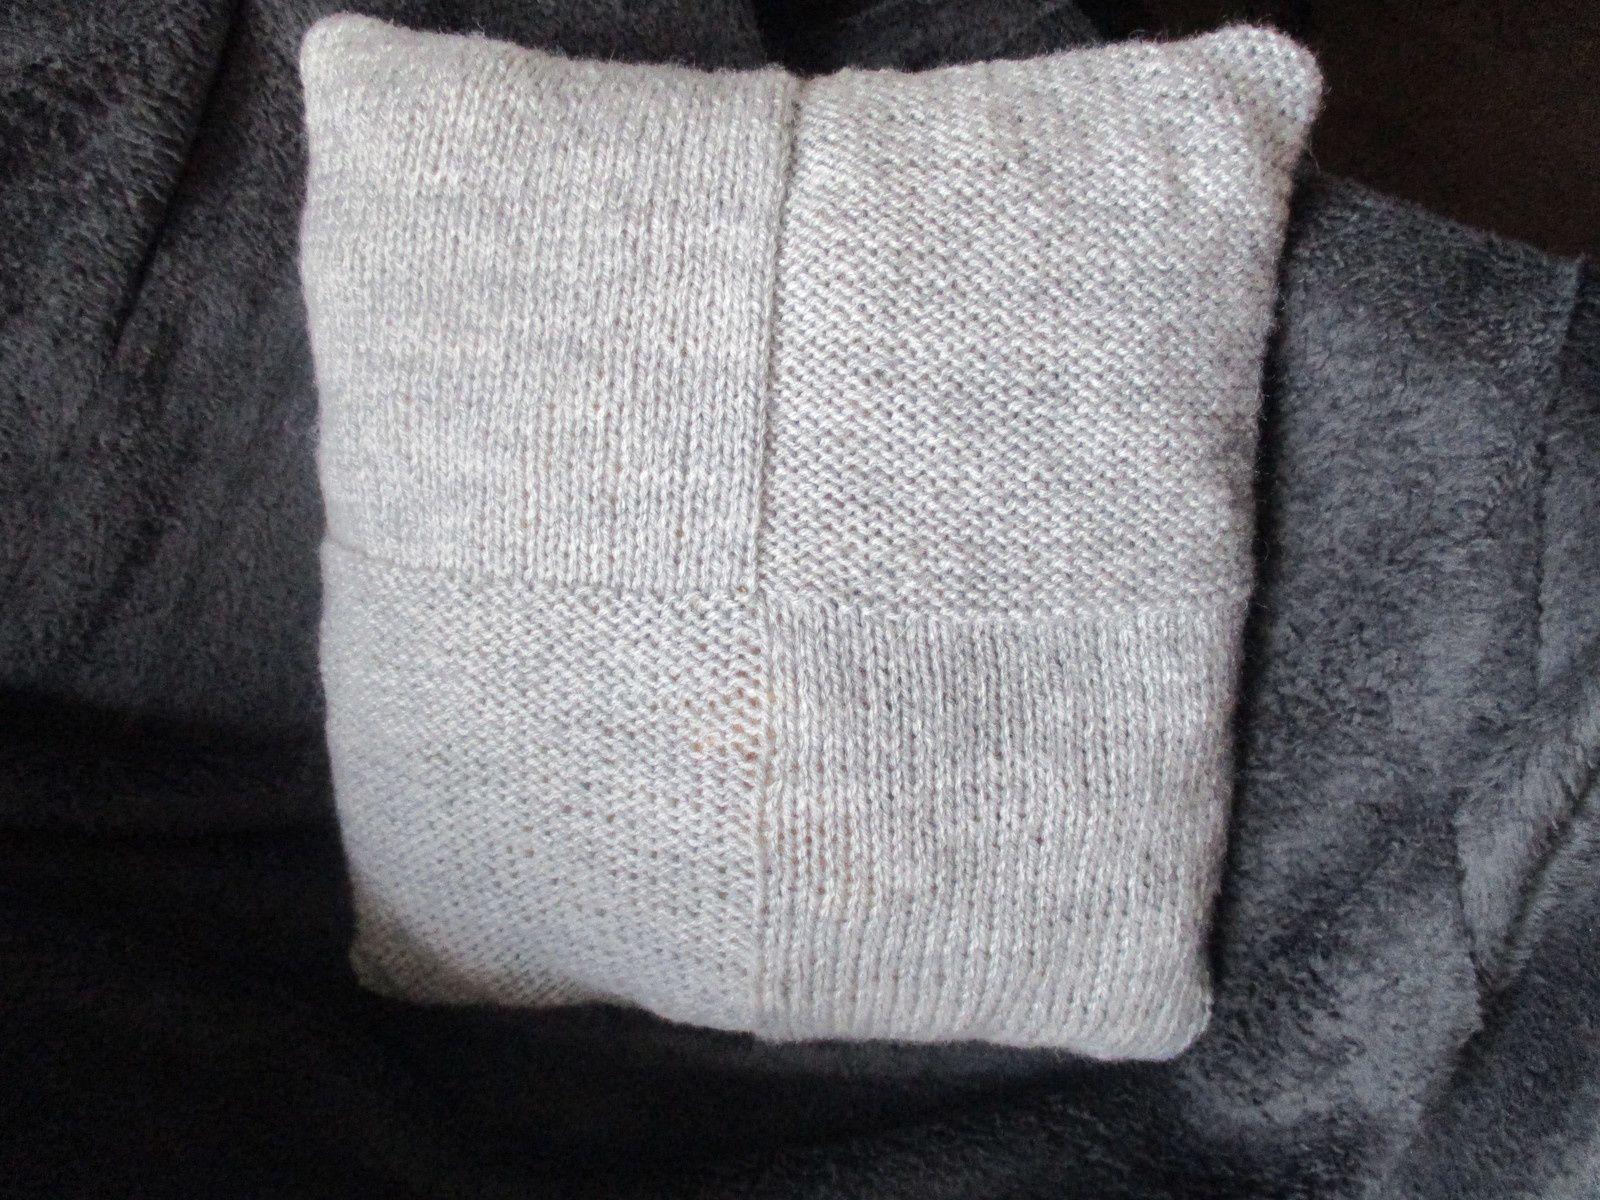 Coussin tricot tout chaud